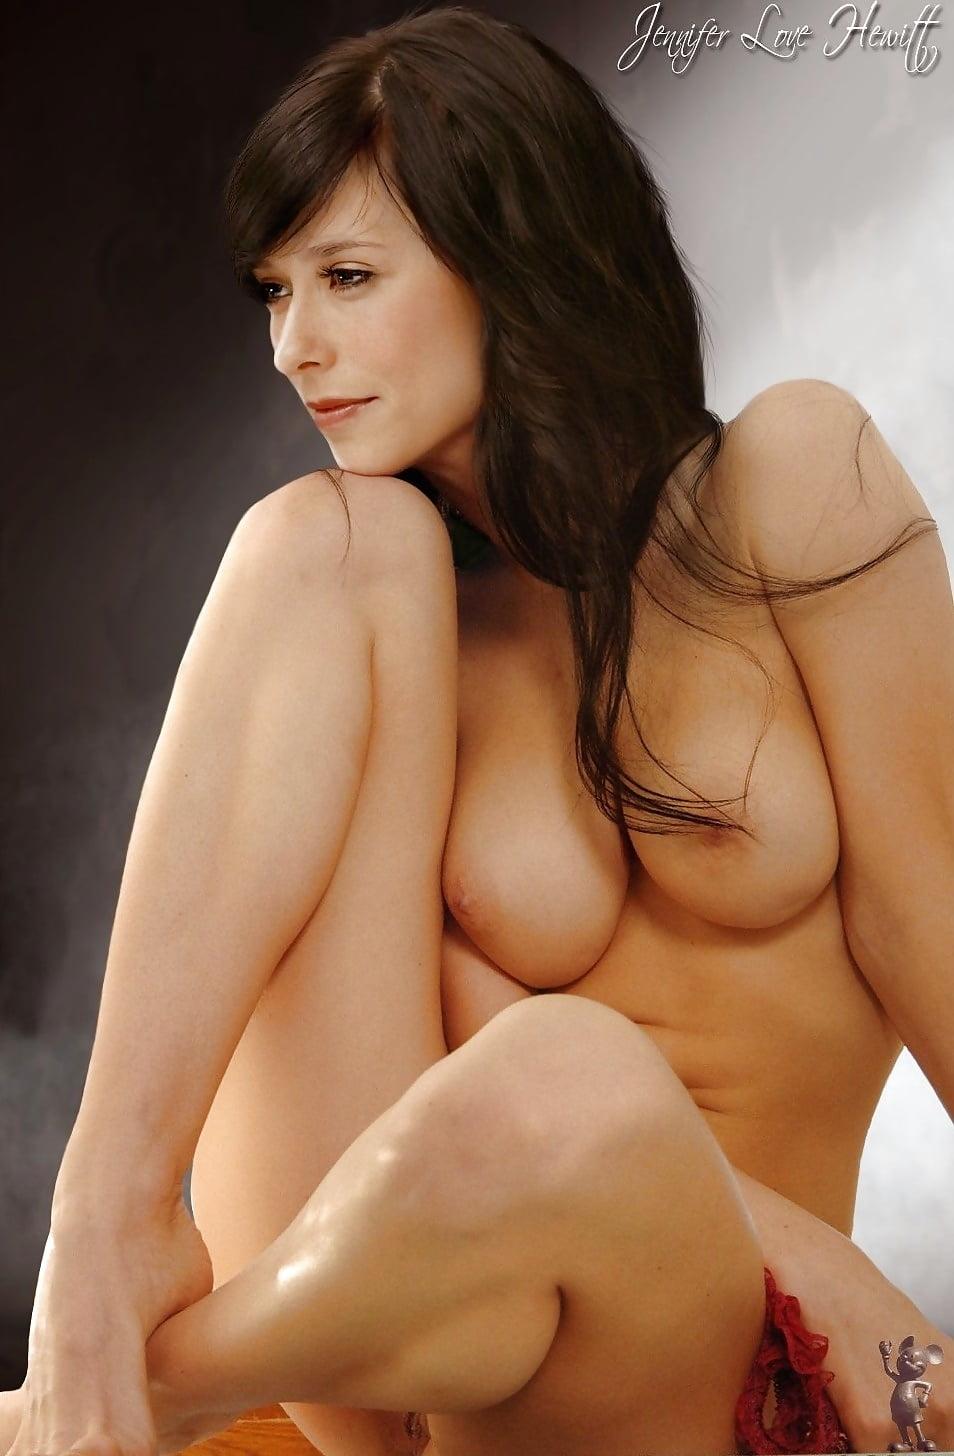 Jennifer Love Hewitt Fake Porn